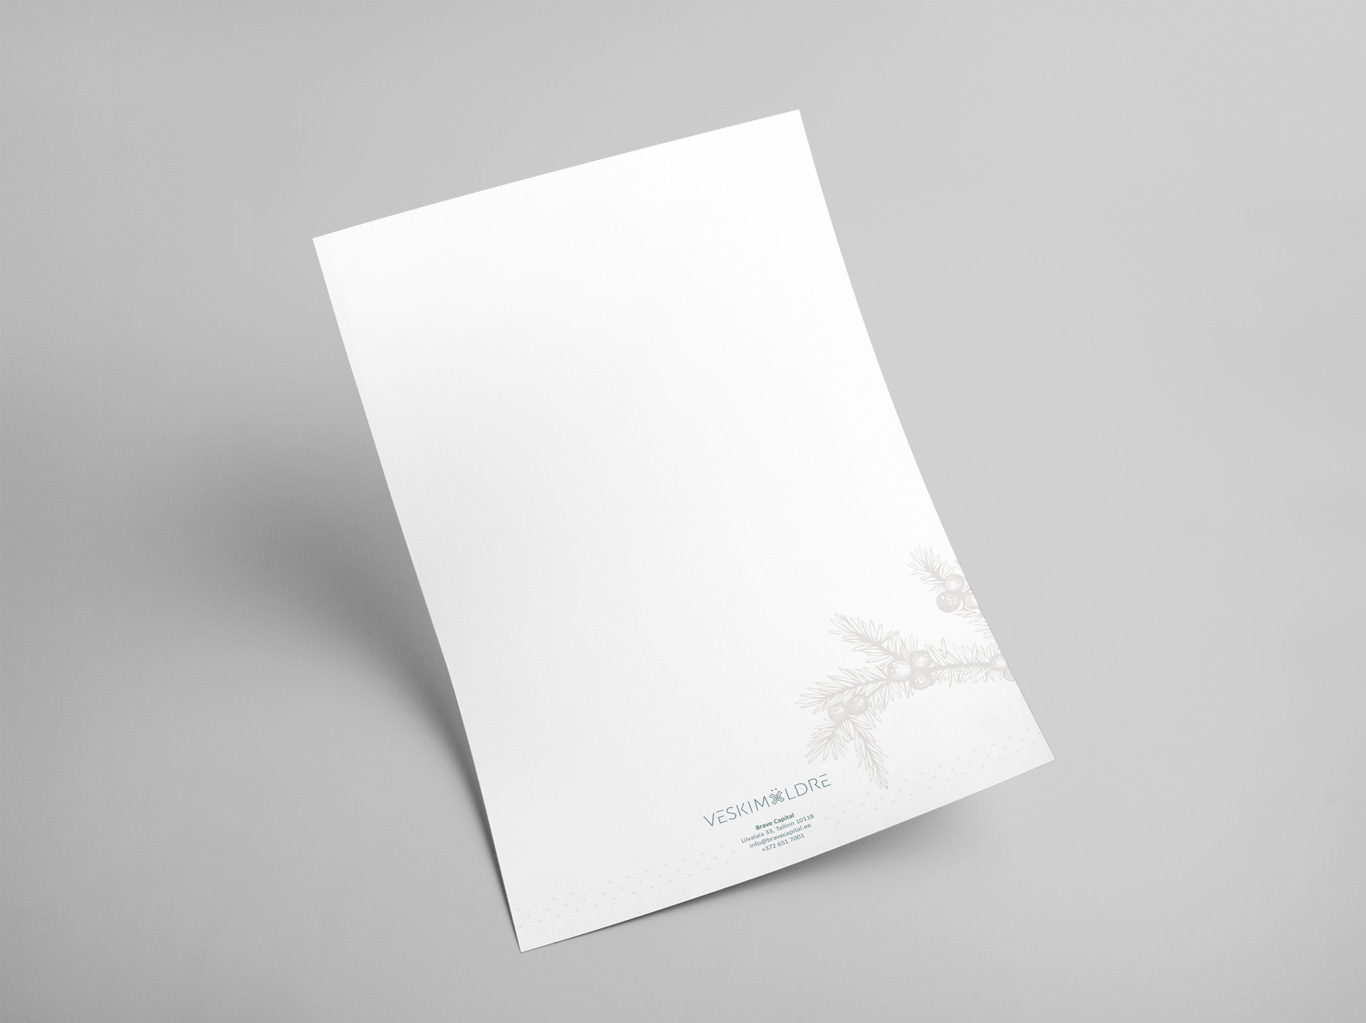 veskimoldre-blank